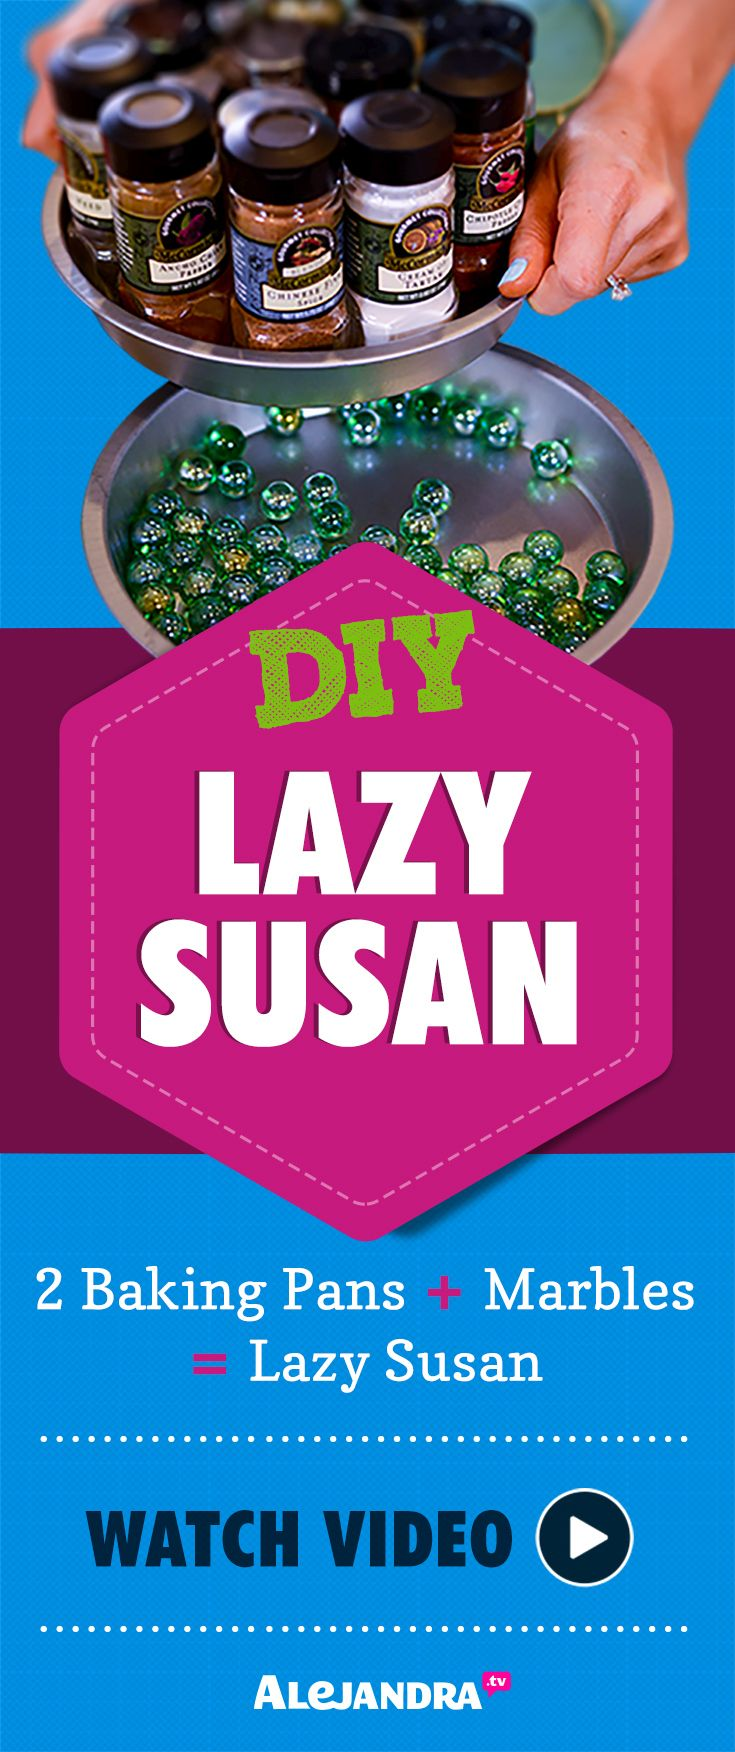 DIY Lazy Susan - Watch Video Tutorial Here:  https://www.alejandra.tv/recommends/pin-diy-organization-ideas-part-1